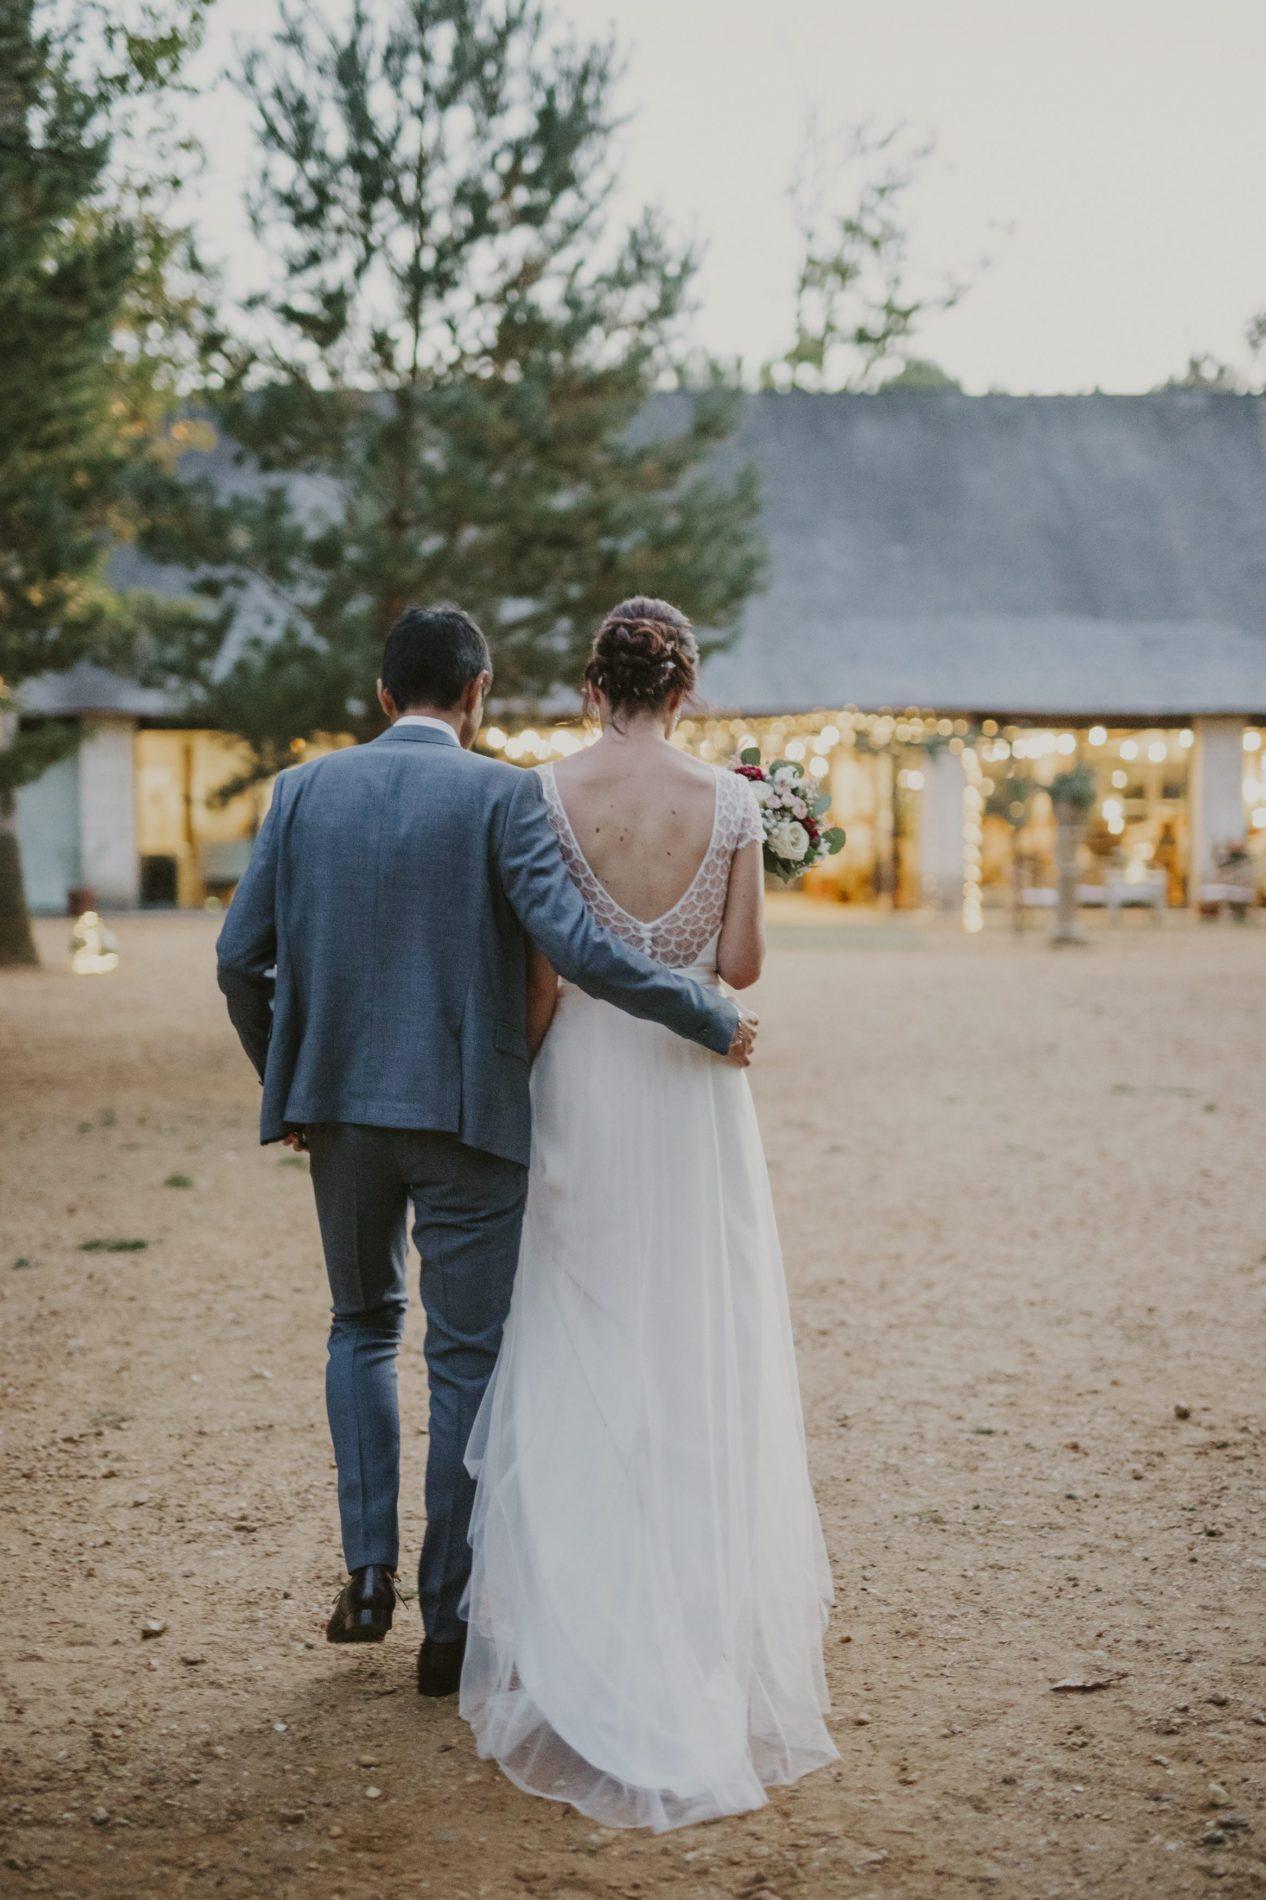 0009_06-CelineSereivuth-9-obonheurdesdames-decoration-mariage-location-Jordane-Chaillou